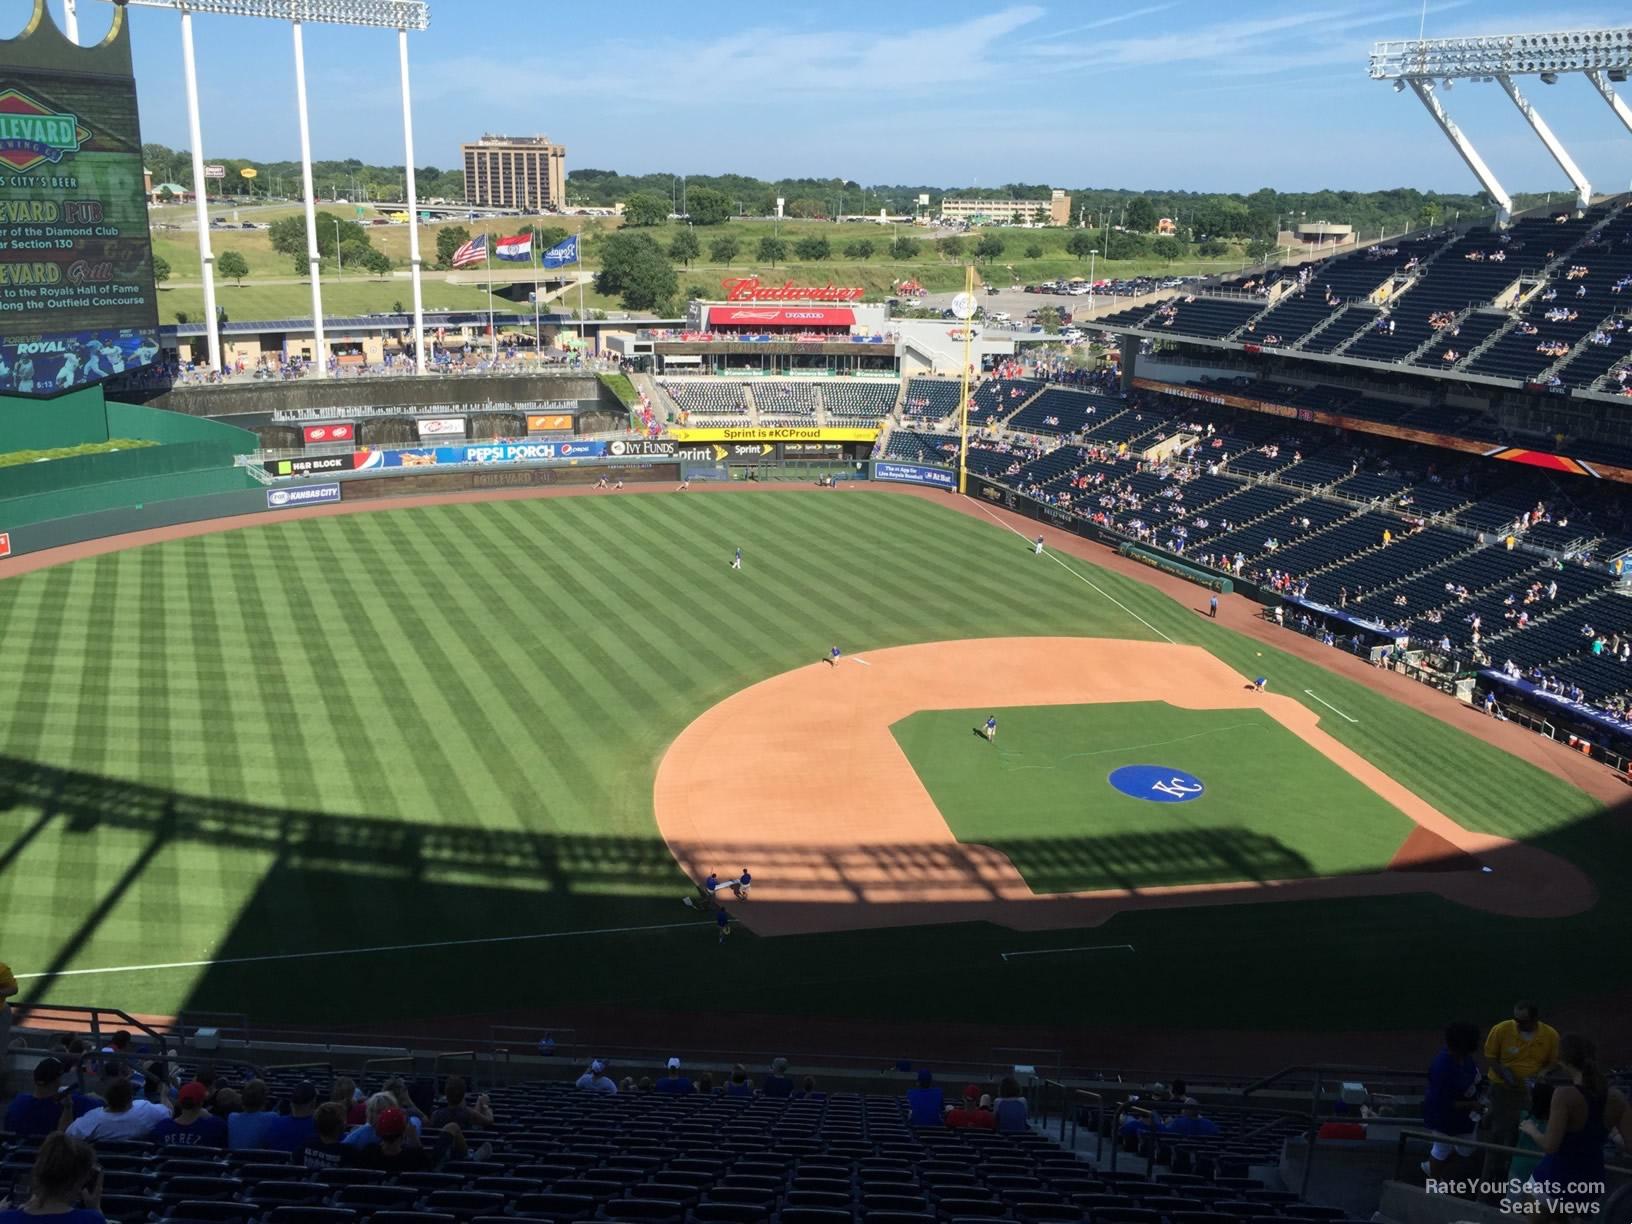 Kauffman Stadium Section 409 - RateYourSeats.com